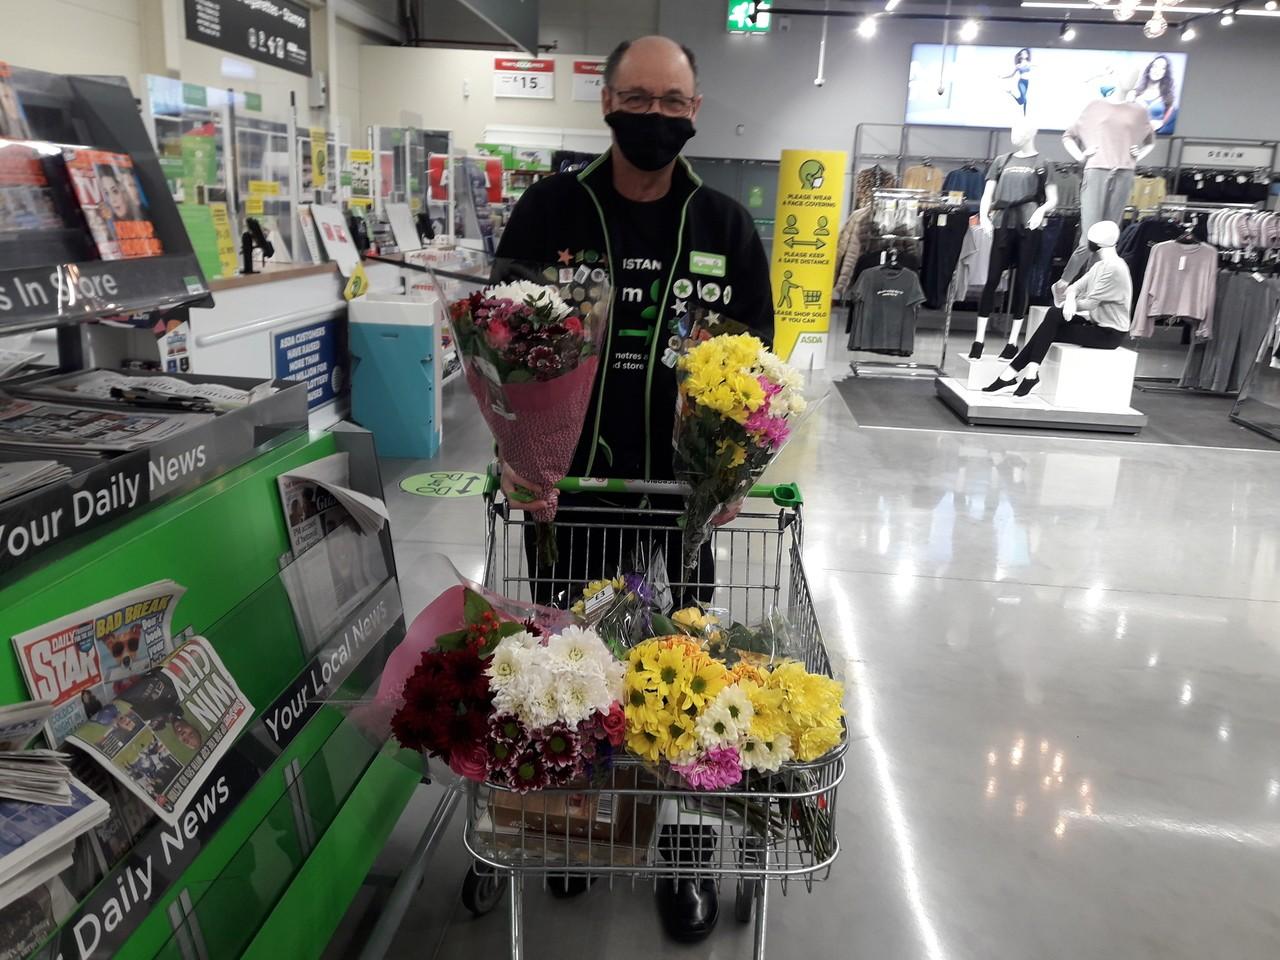 Flowers forPark Lane Care Home 🌻 | Asda Barnstaple